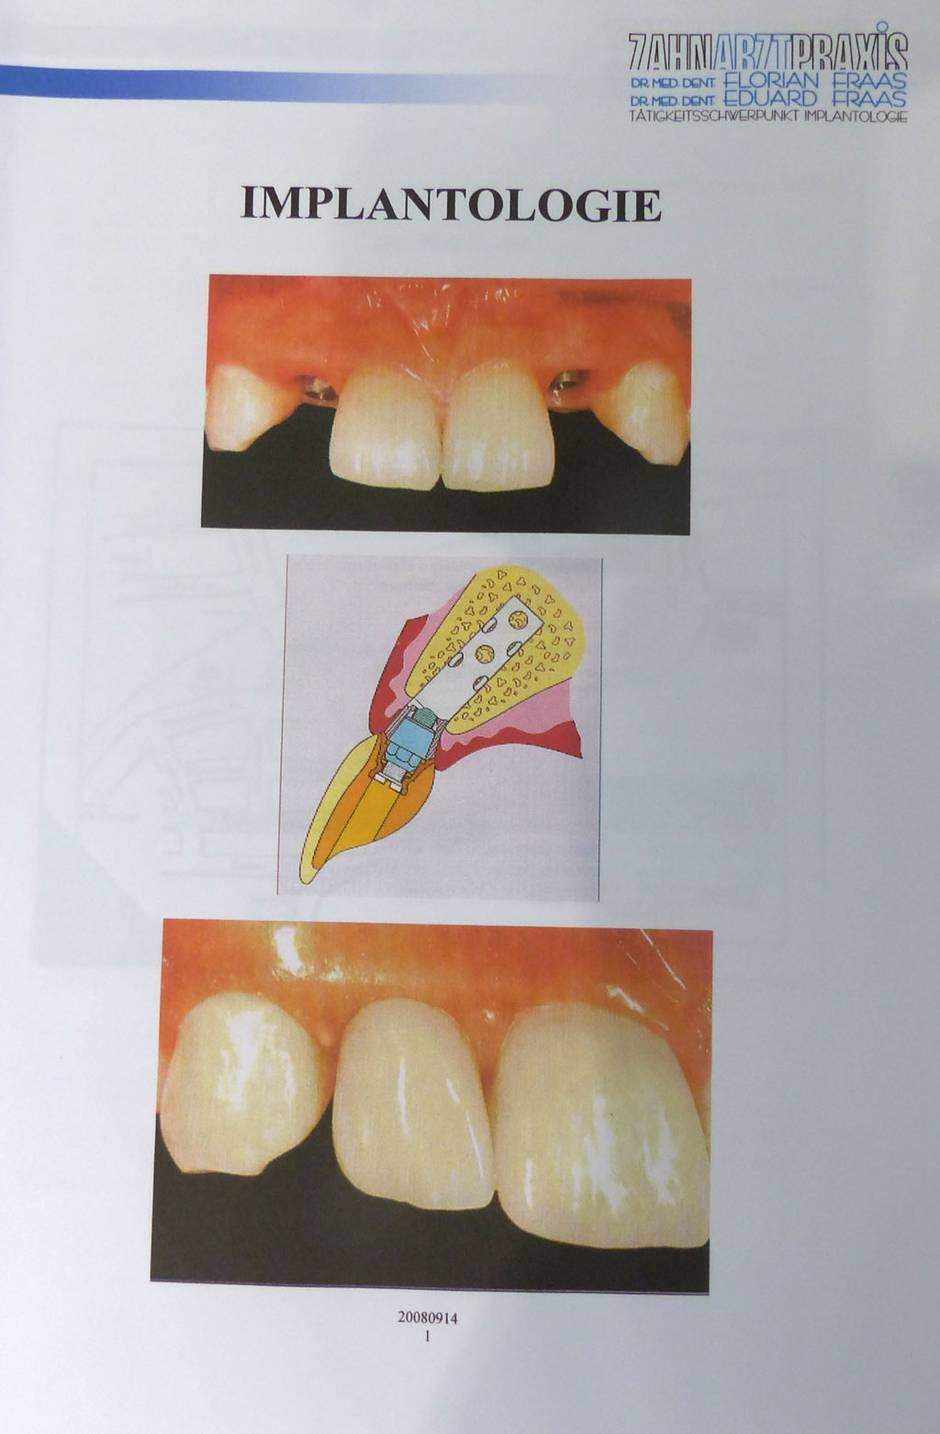 Implantatordner